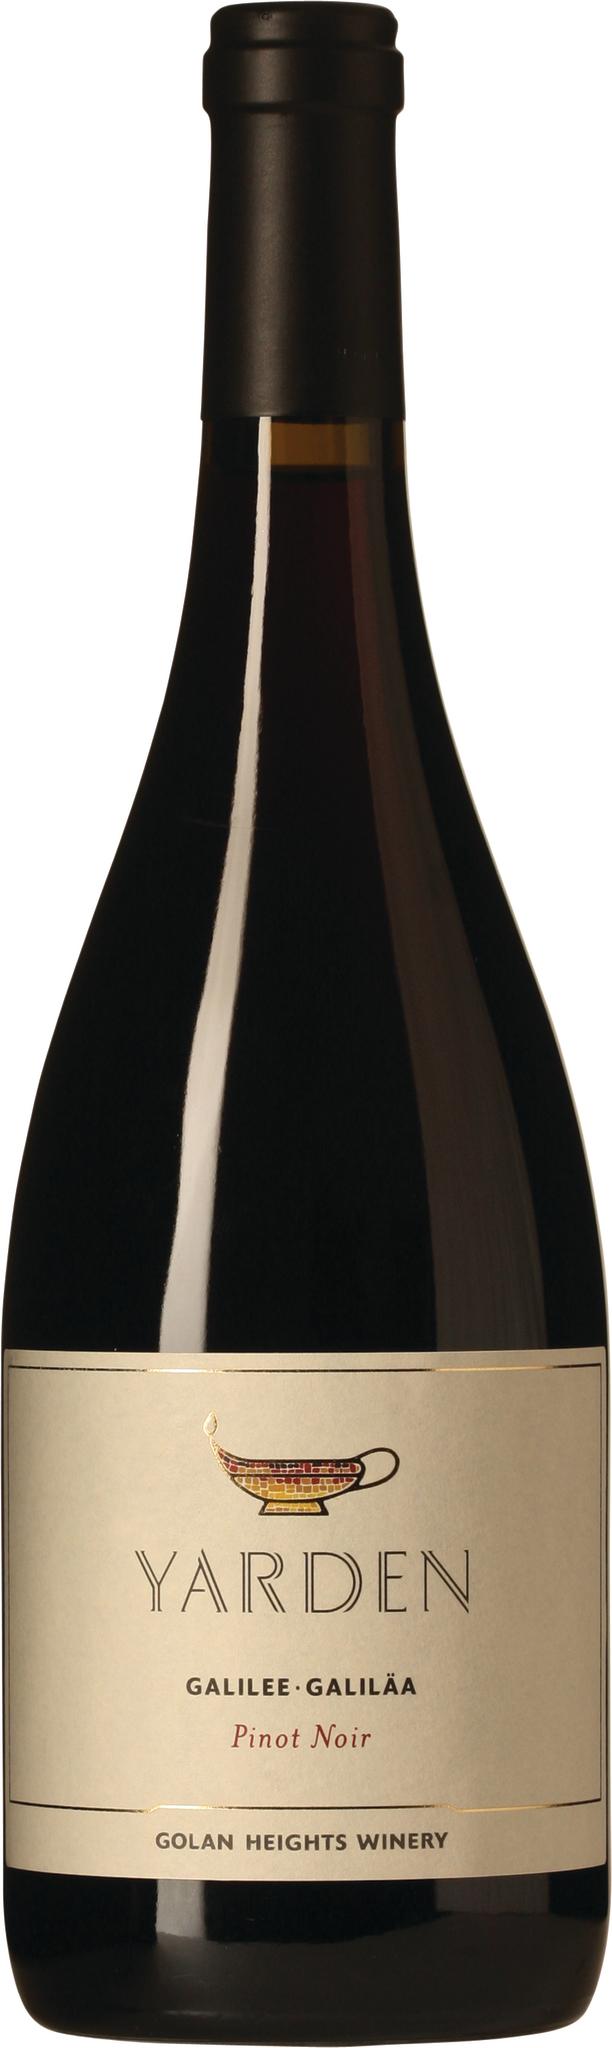 Golan Heights Winery - YARDEN Pinot Noir